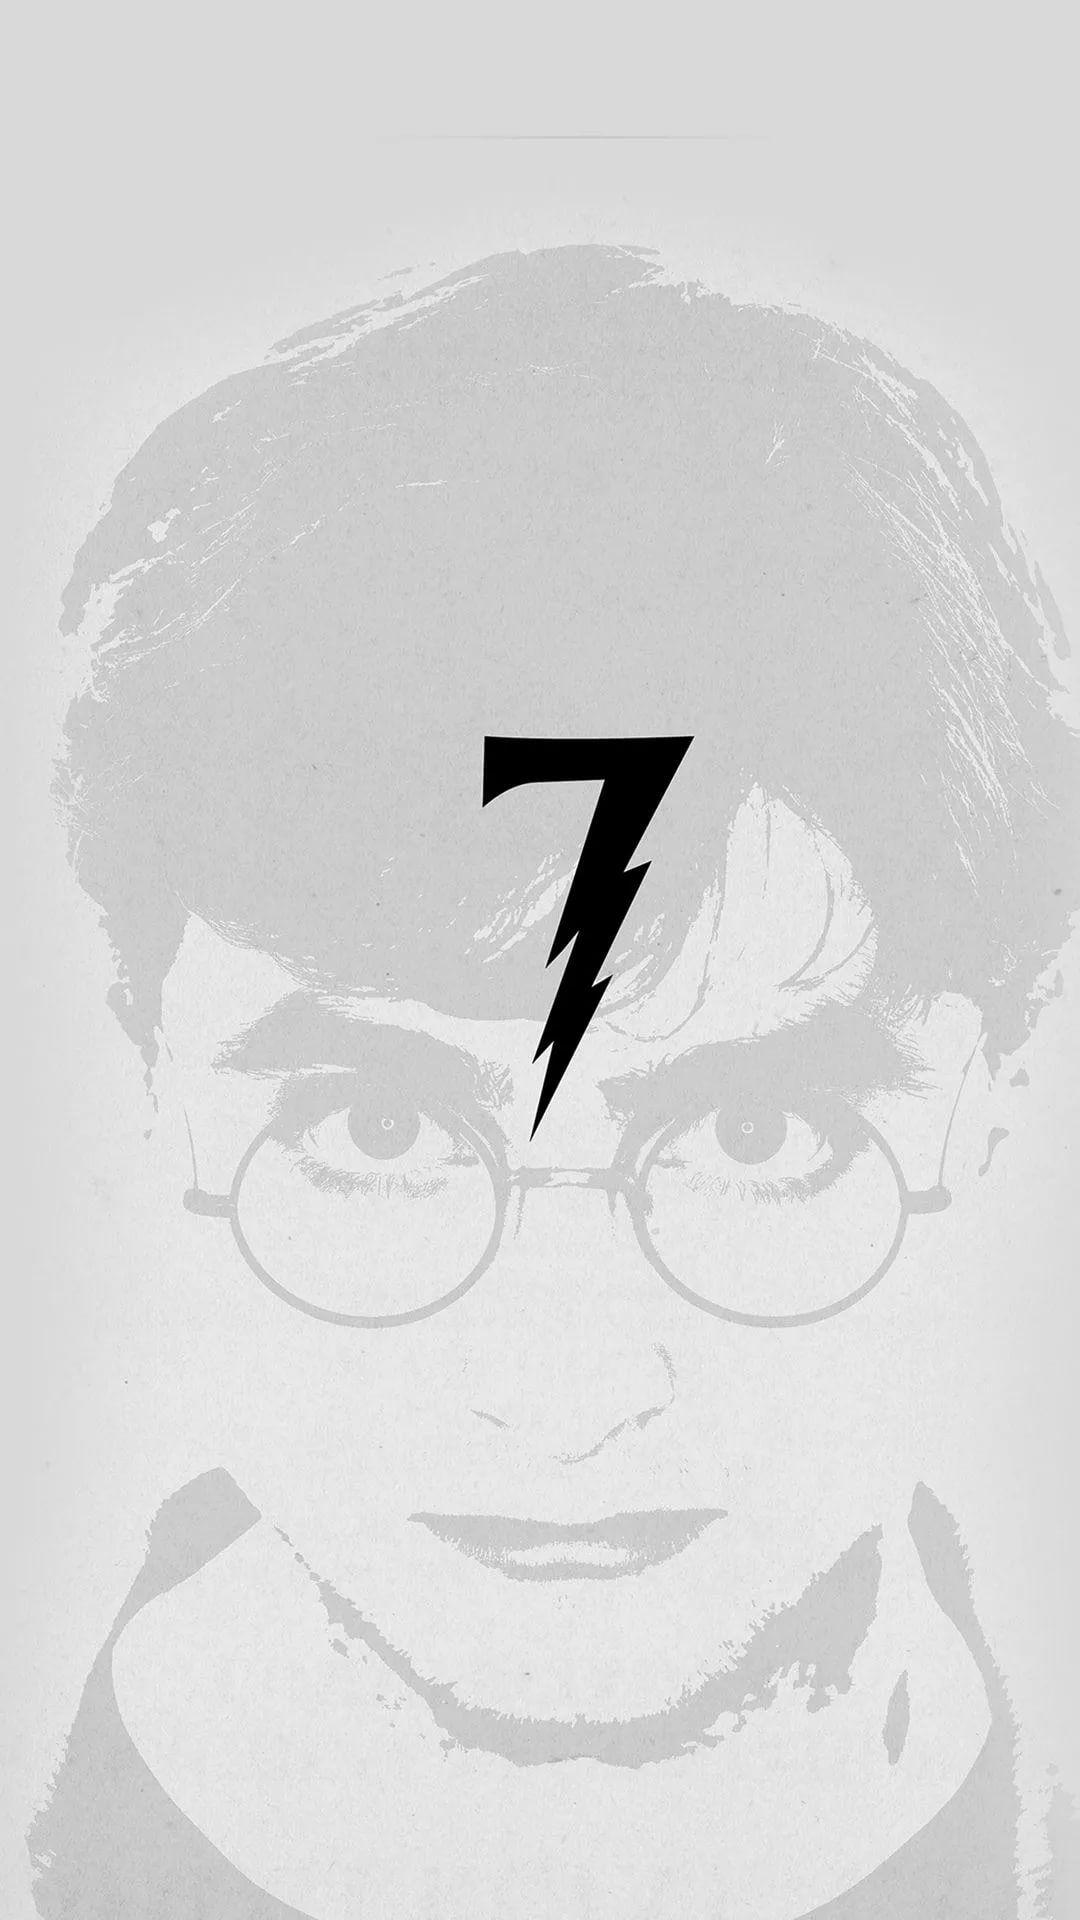 Harry Potter wallpaper